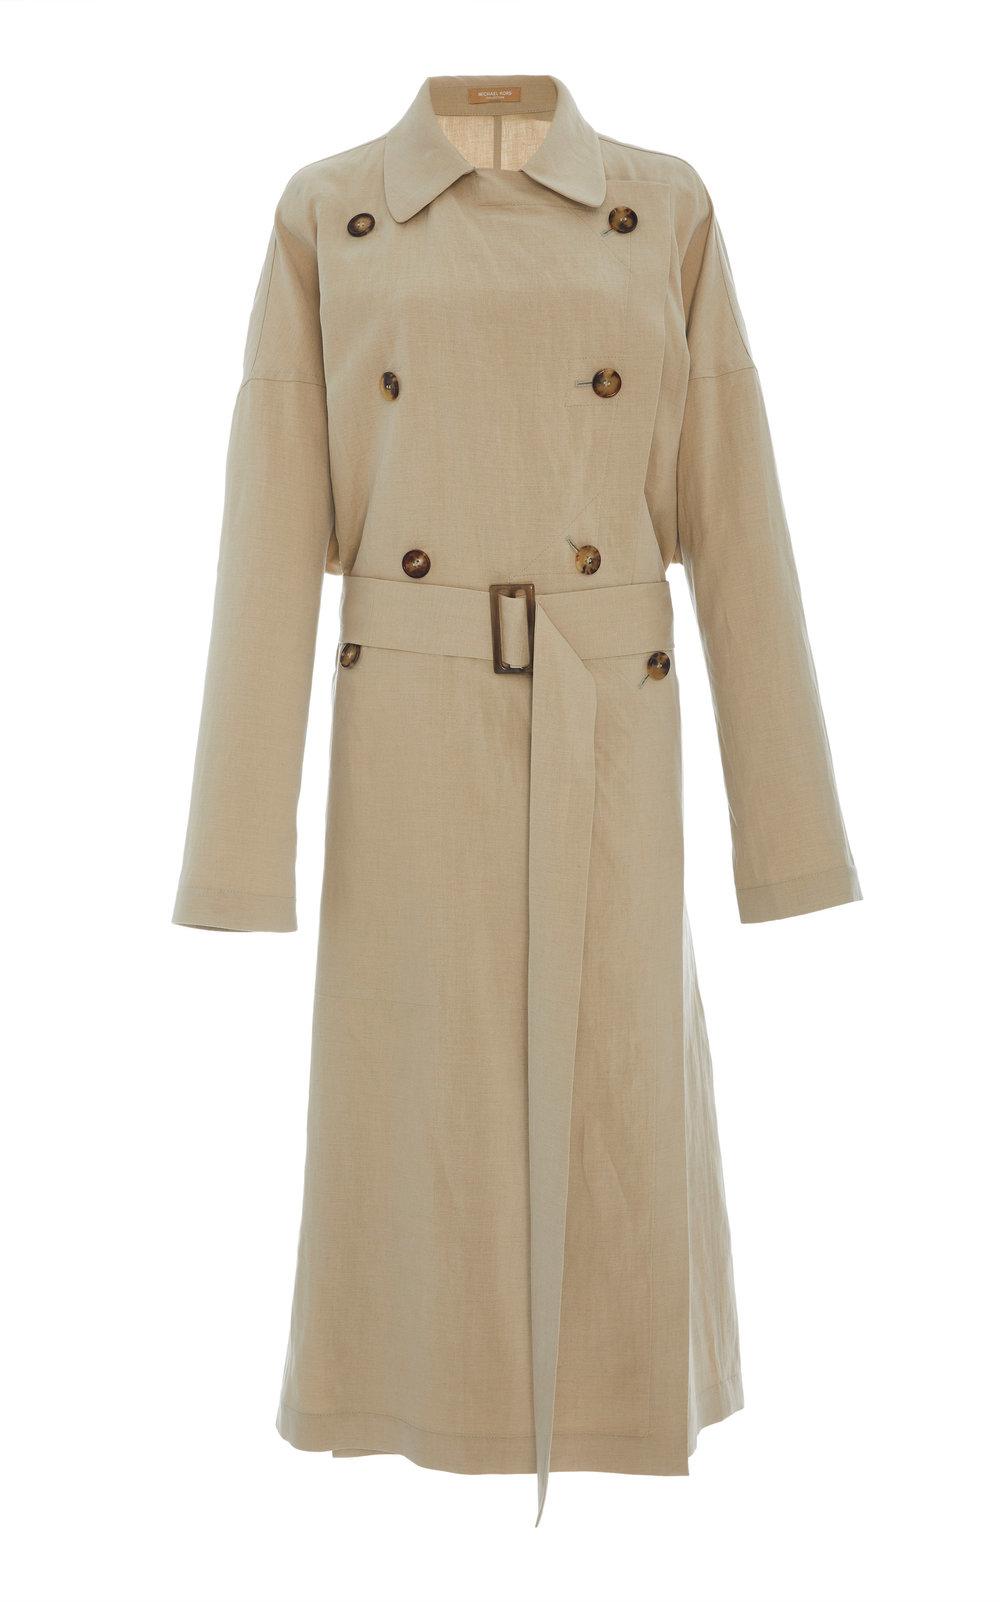 large_michael-kors-neutral-belted-linen-coat.jpg